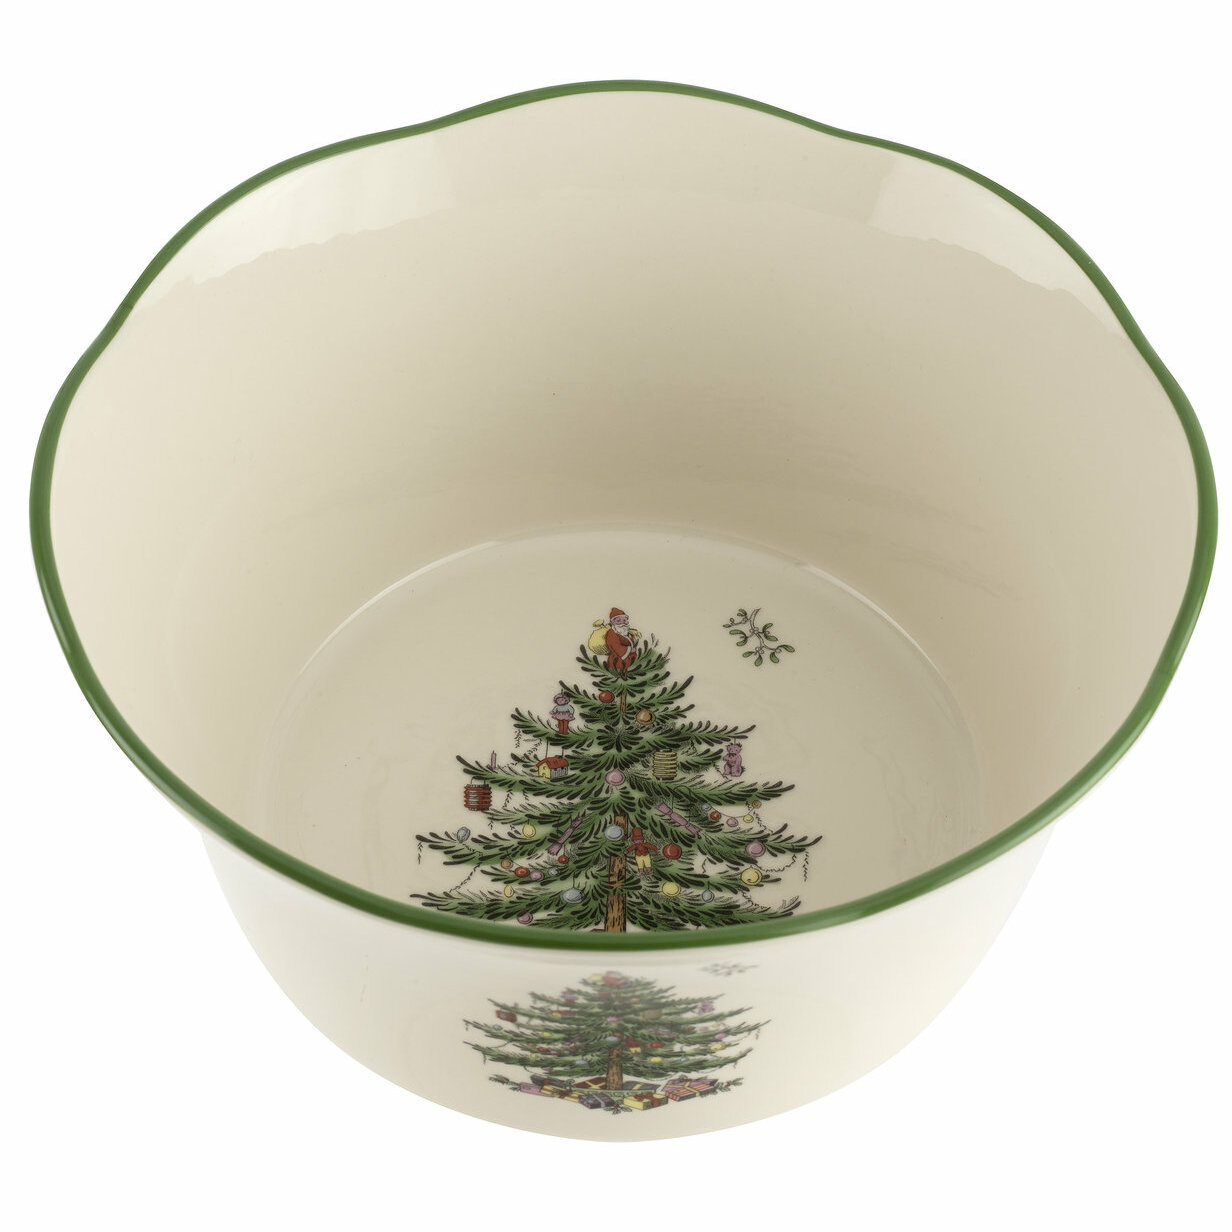 Spode Christmas Tree Candy Nut Bowl Reviews Wayfair